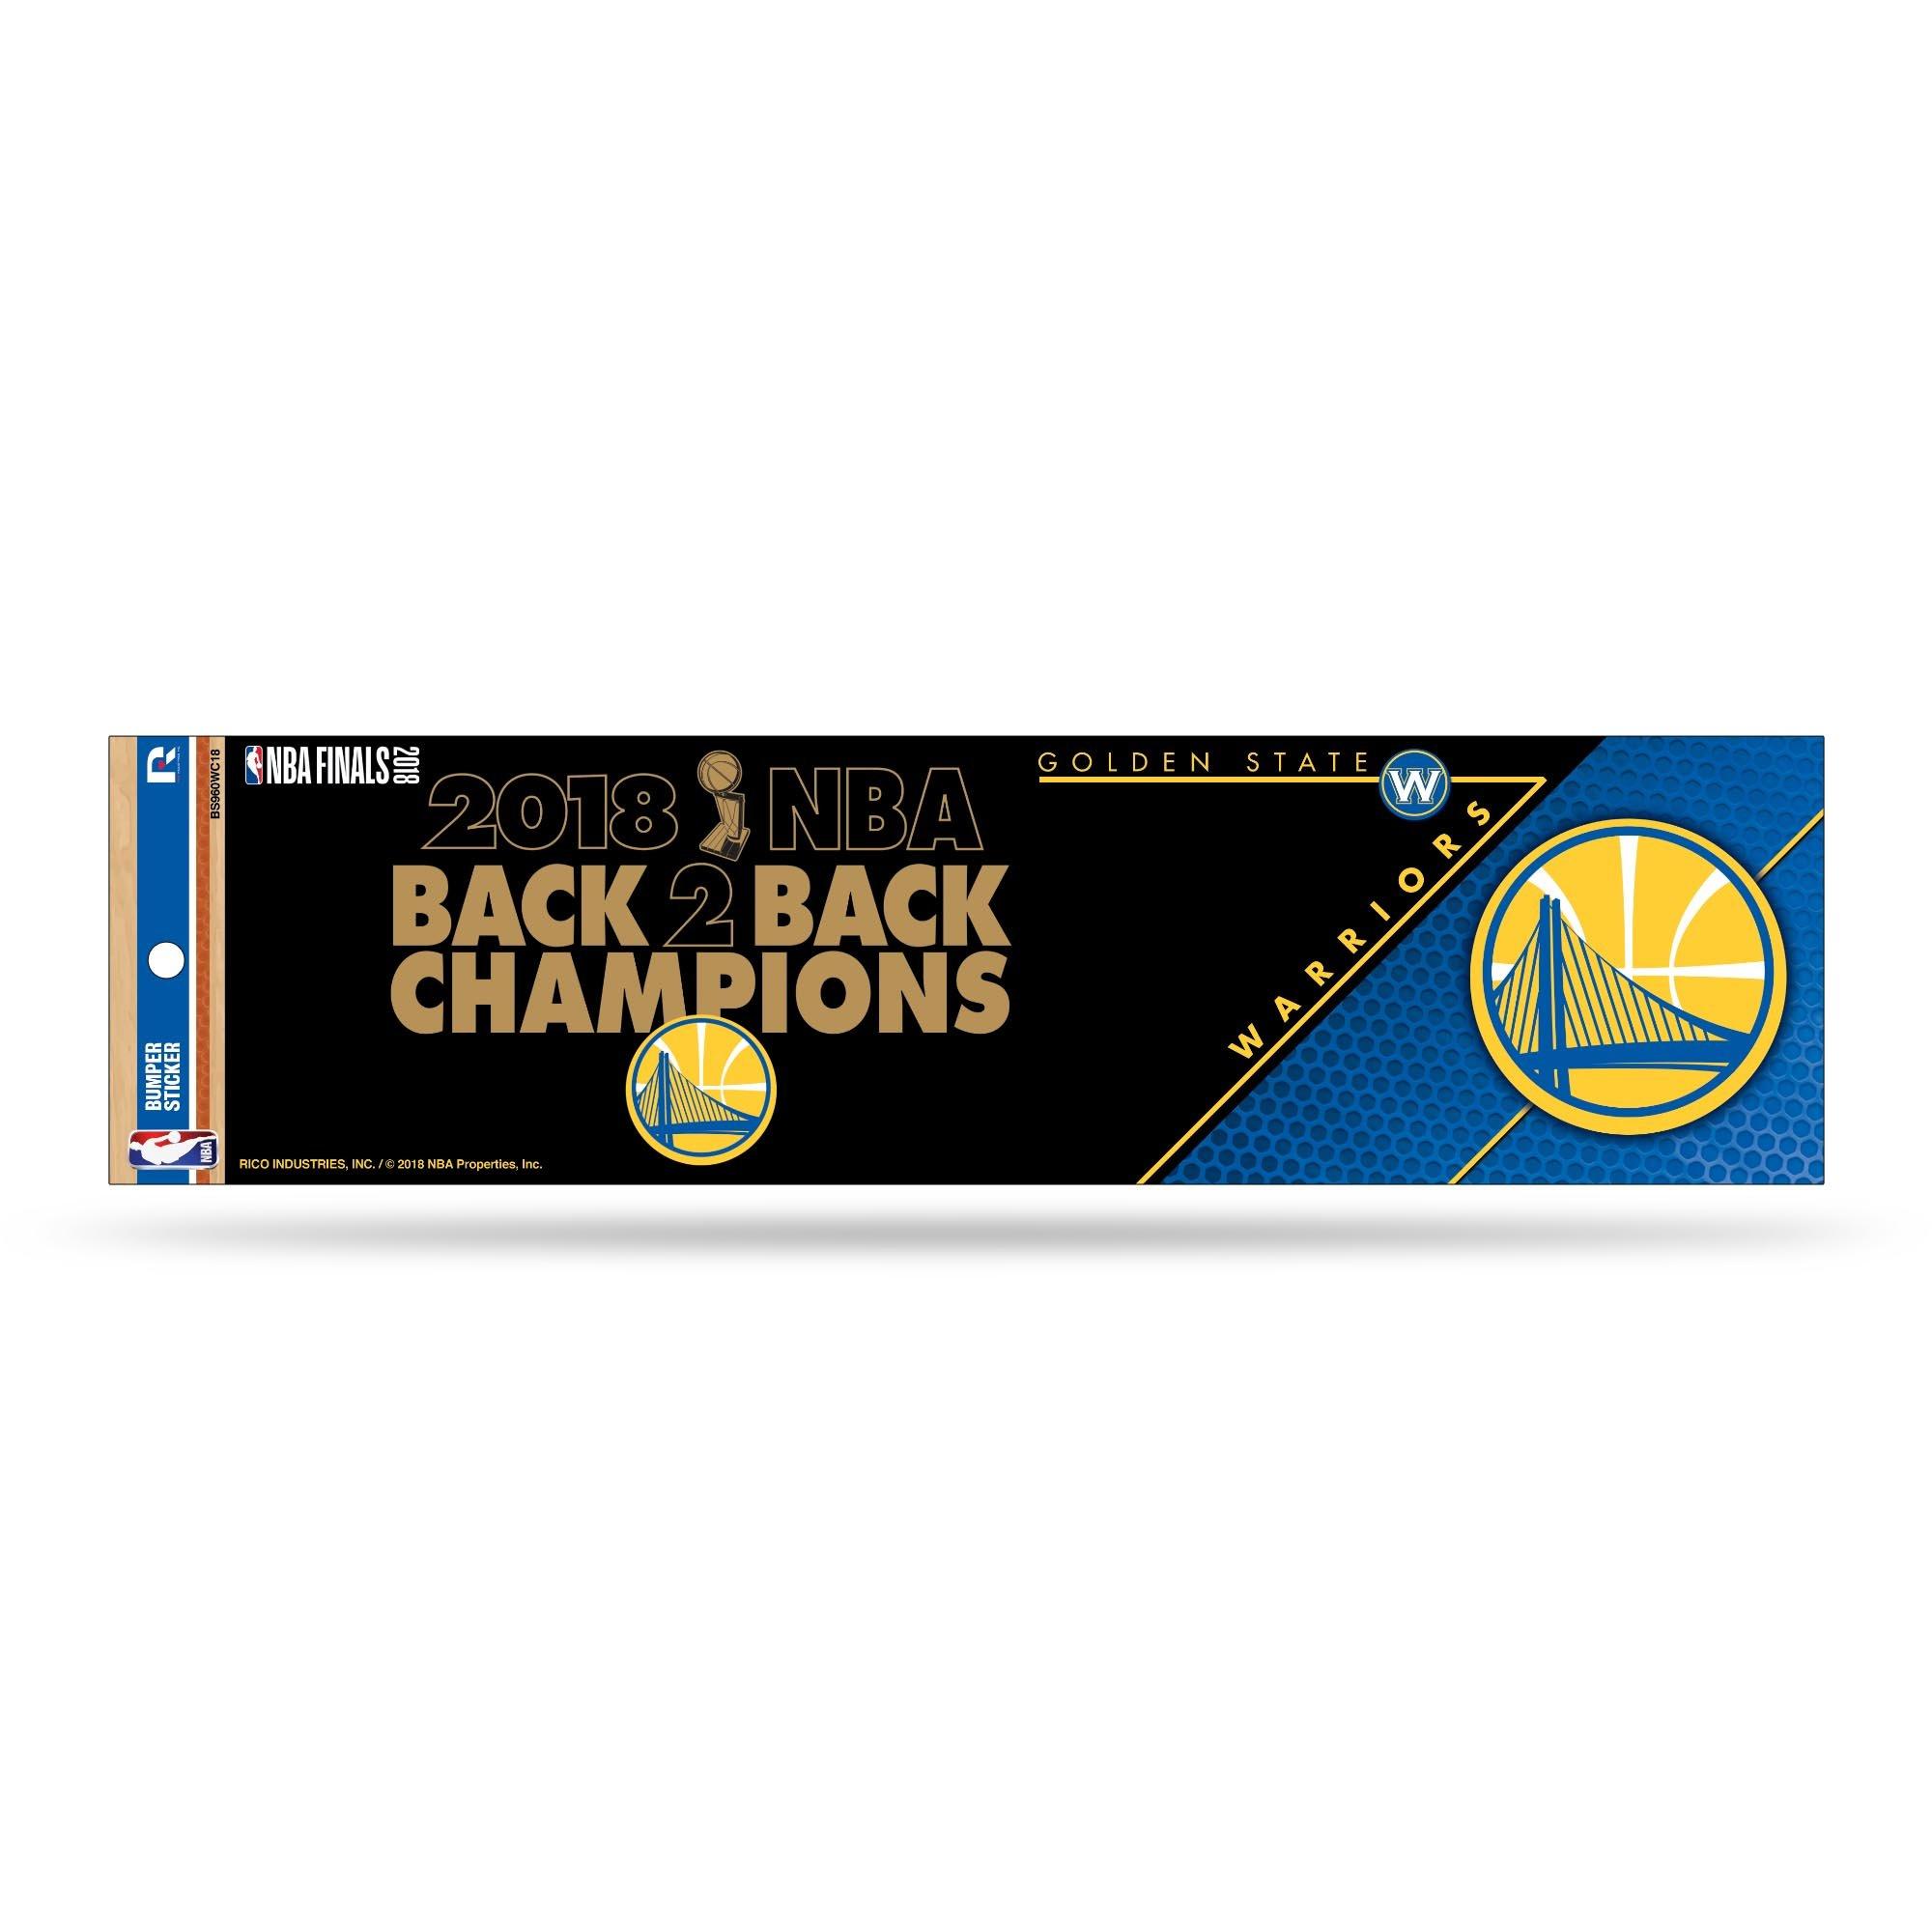 Rico Golden State Warriors Official NBA 12'' x 3'' 2018 National Champions Bumper Sticker Strip Decal 387233